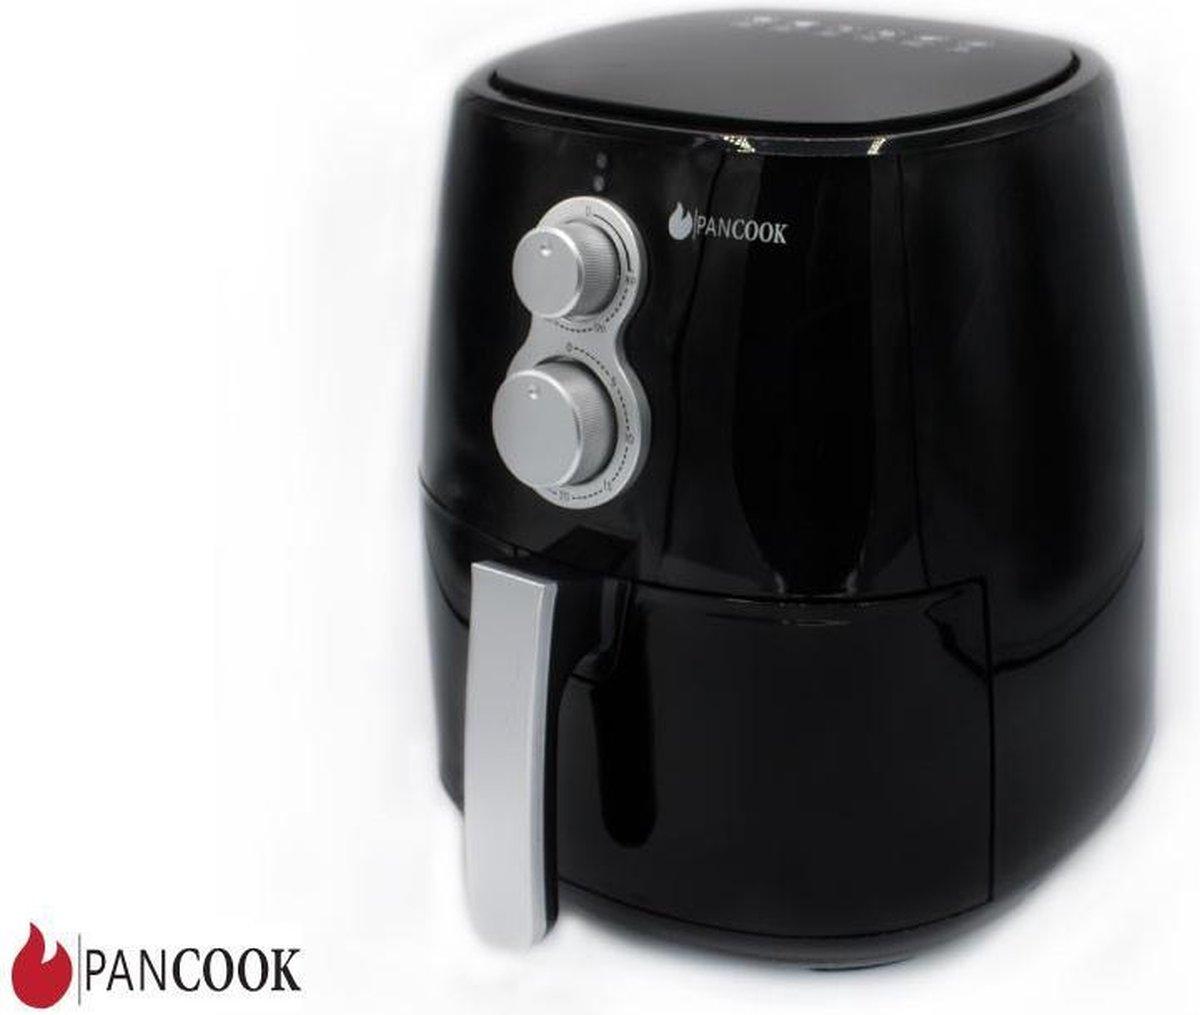 Pancook - Hetelucht friteuse - airfryer - zonder olie - 3.5-4 l